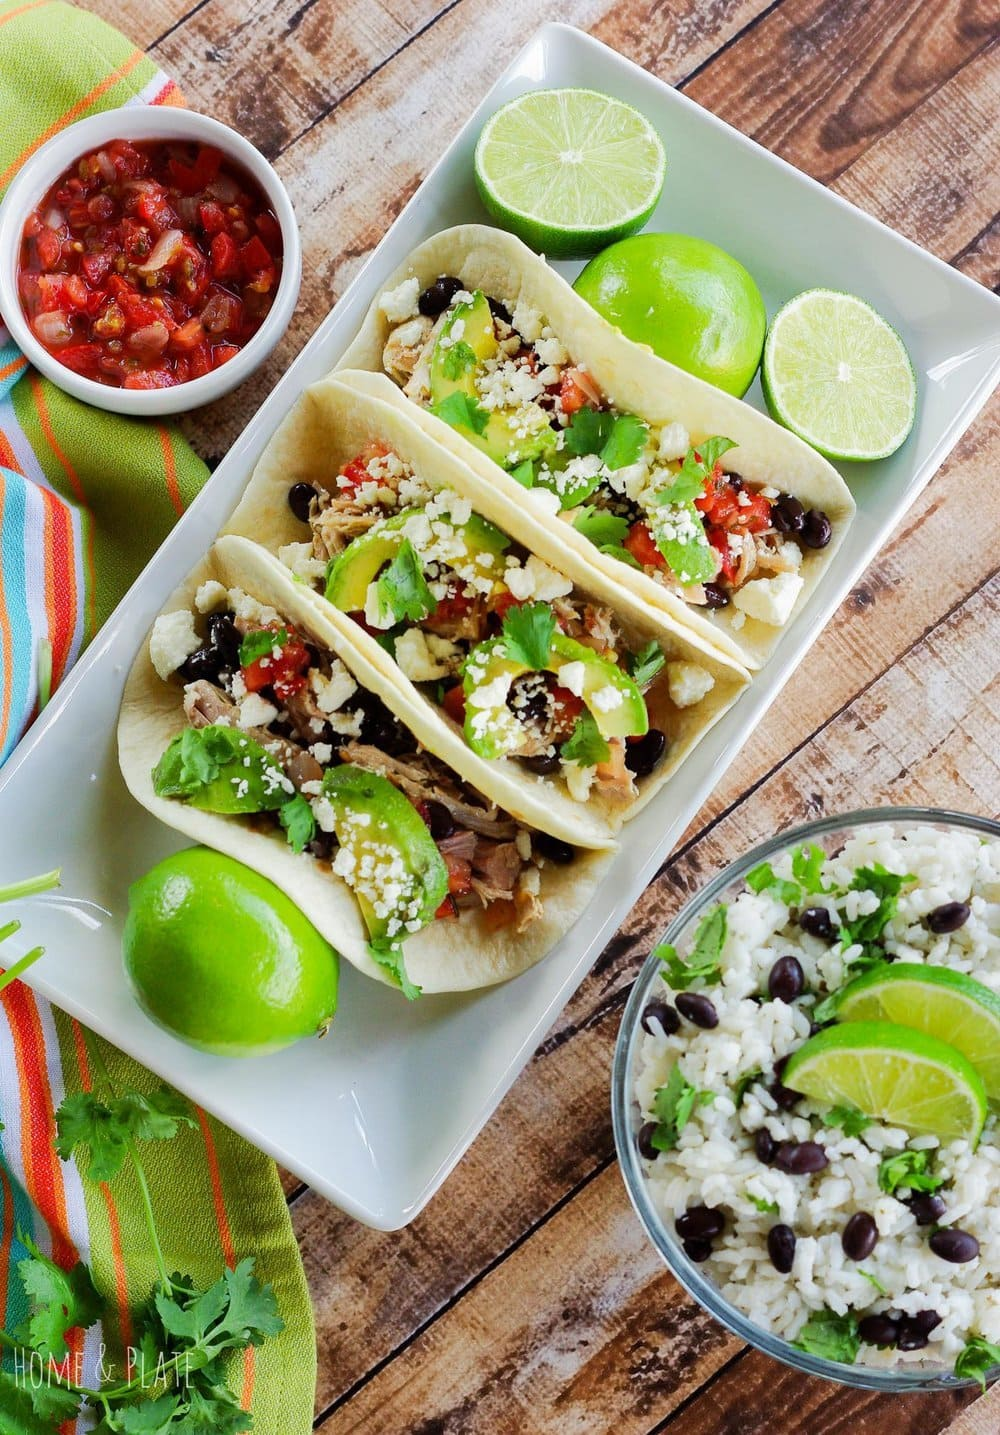 Pulled Pork Tacos aka Pork Carnitas | Home & Plate